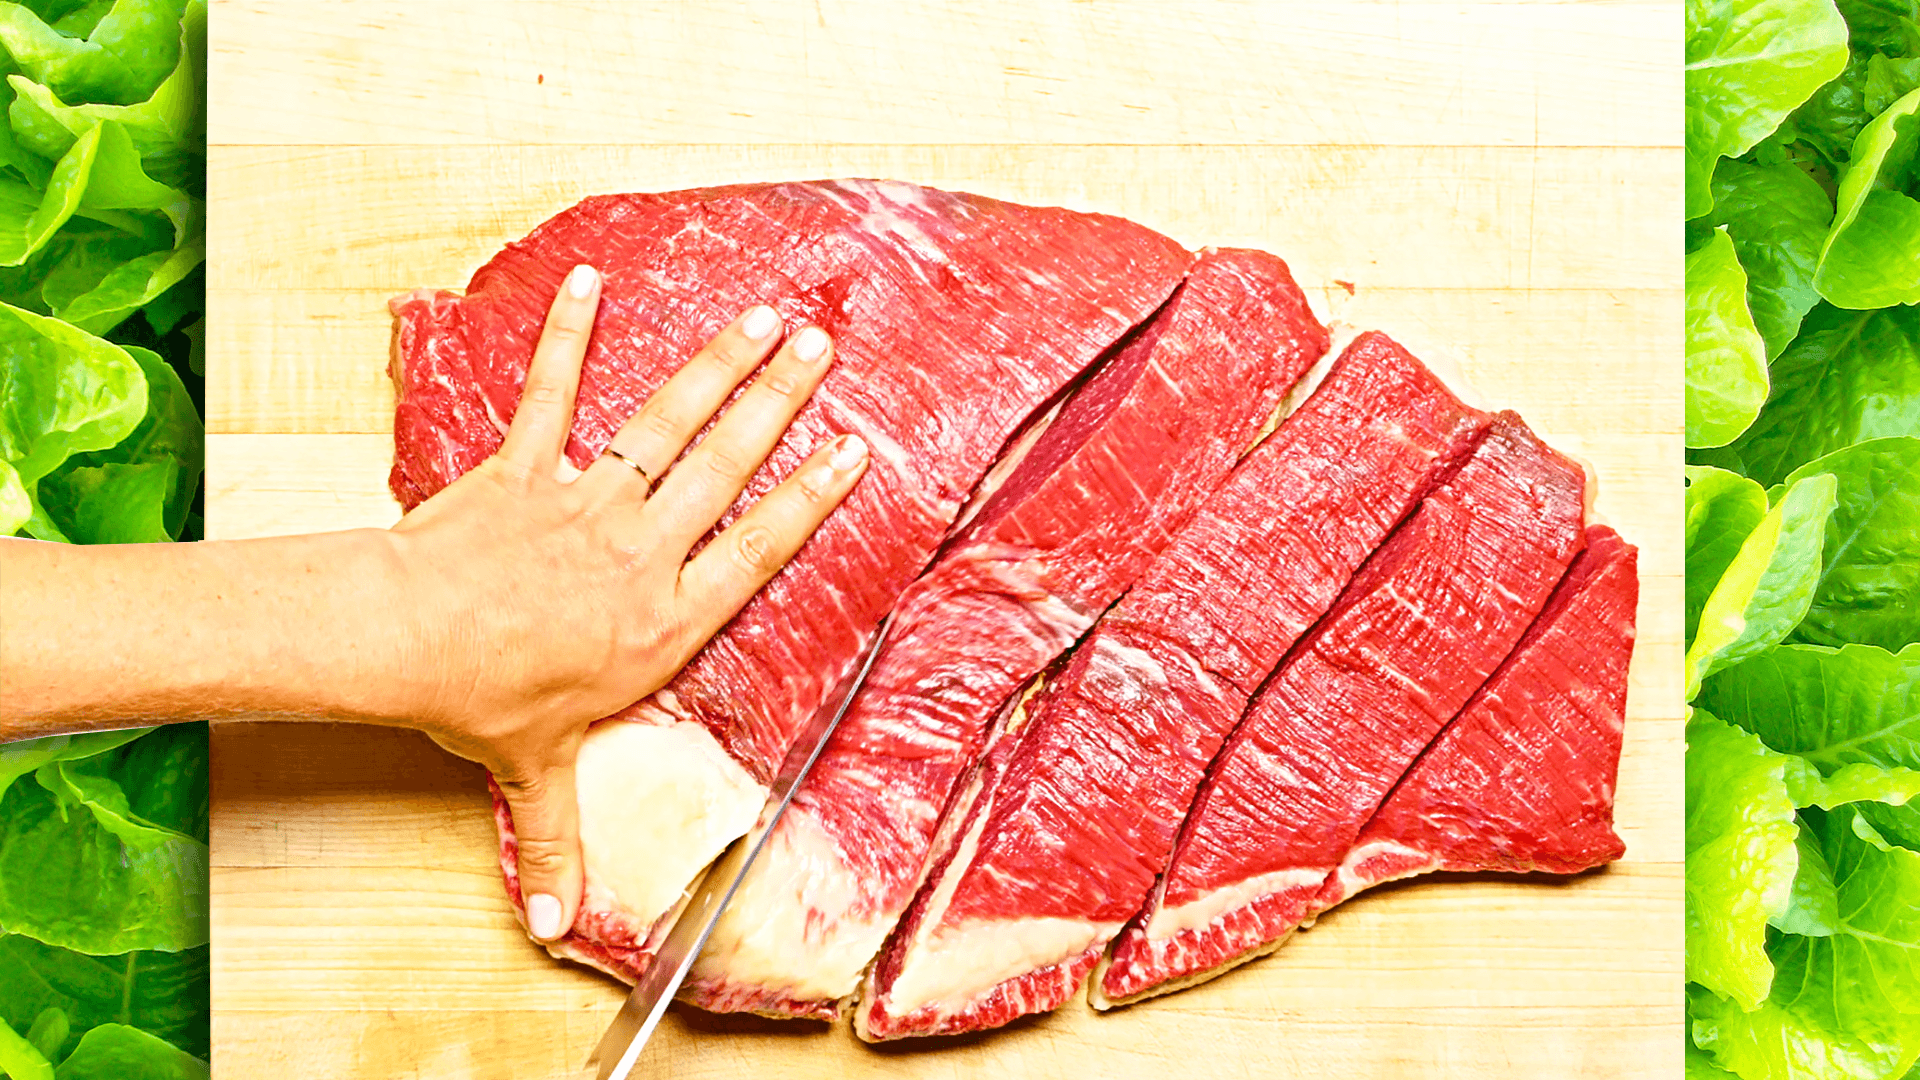 Raw Pork Brisket